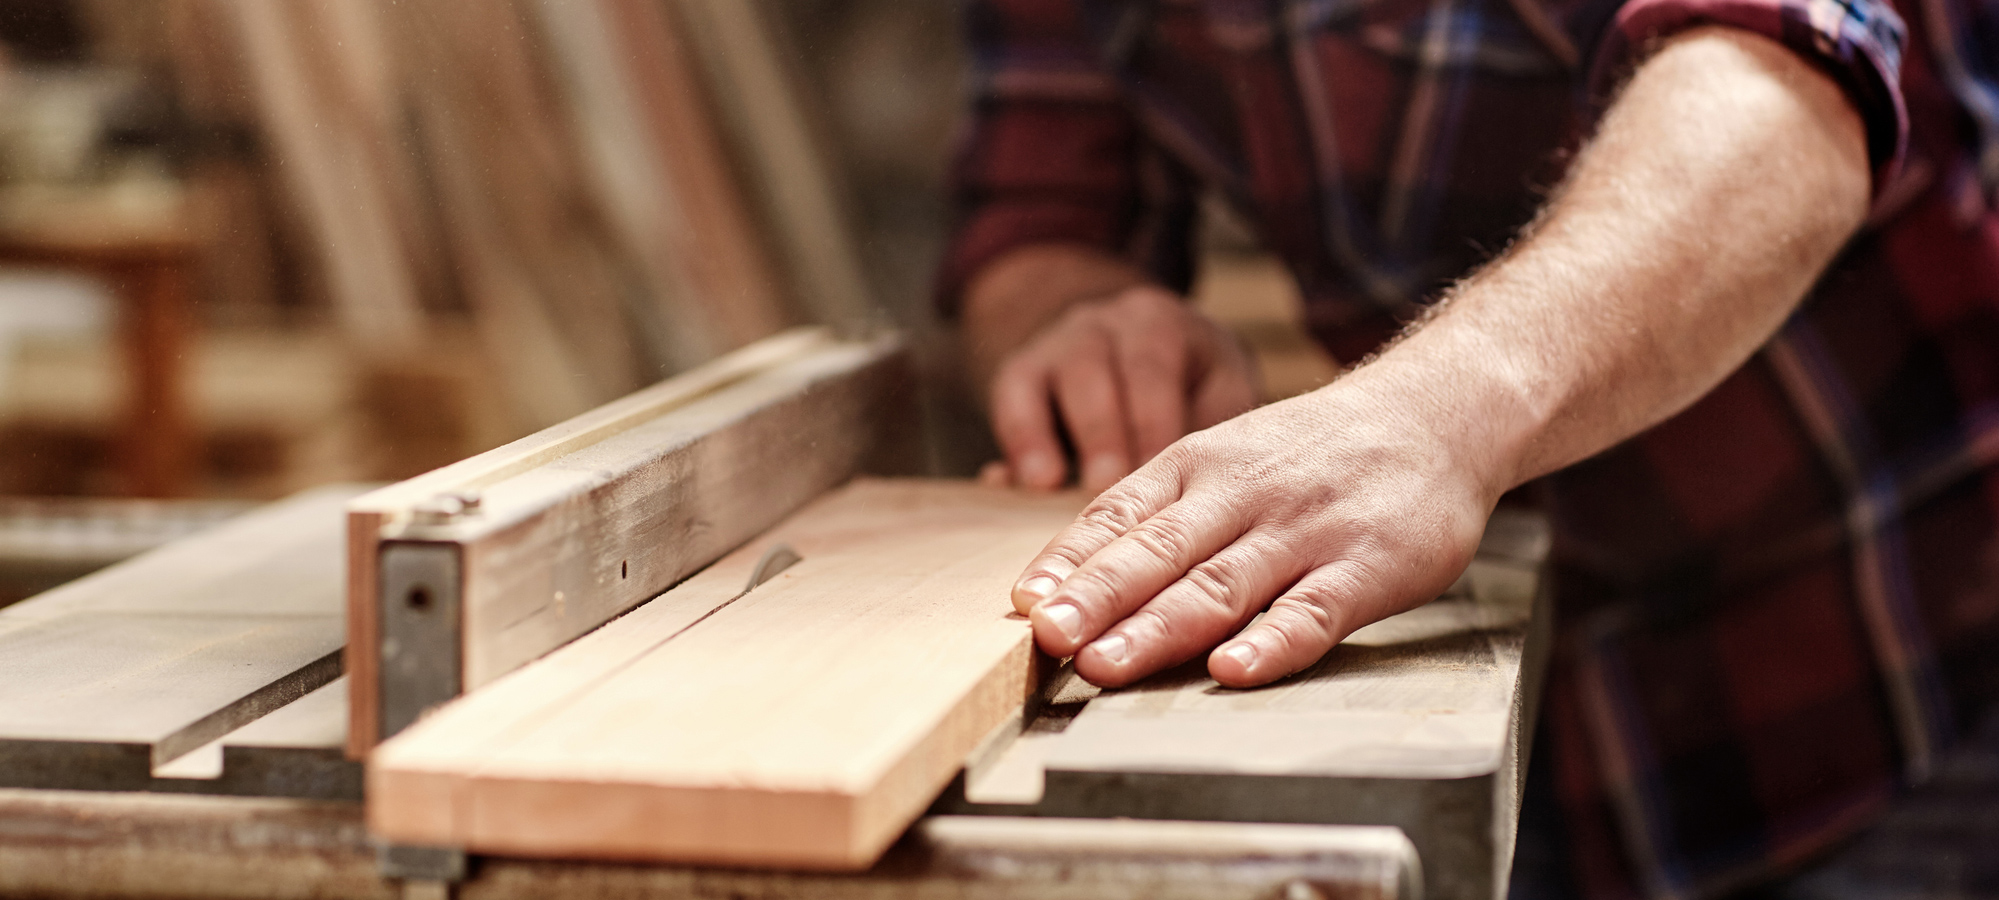 carpentry-construction